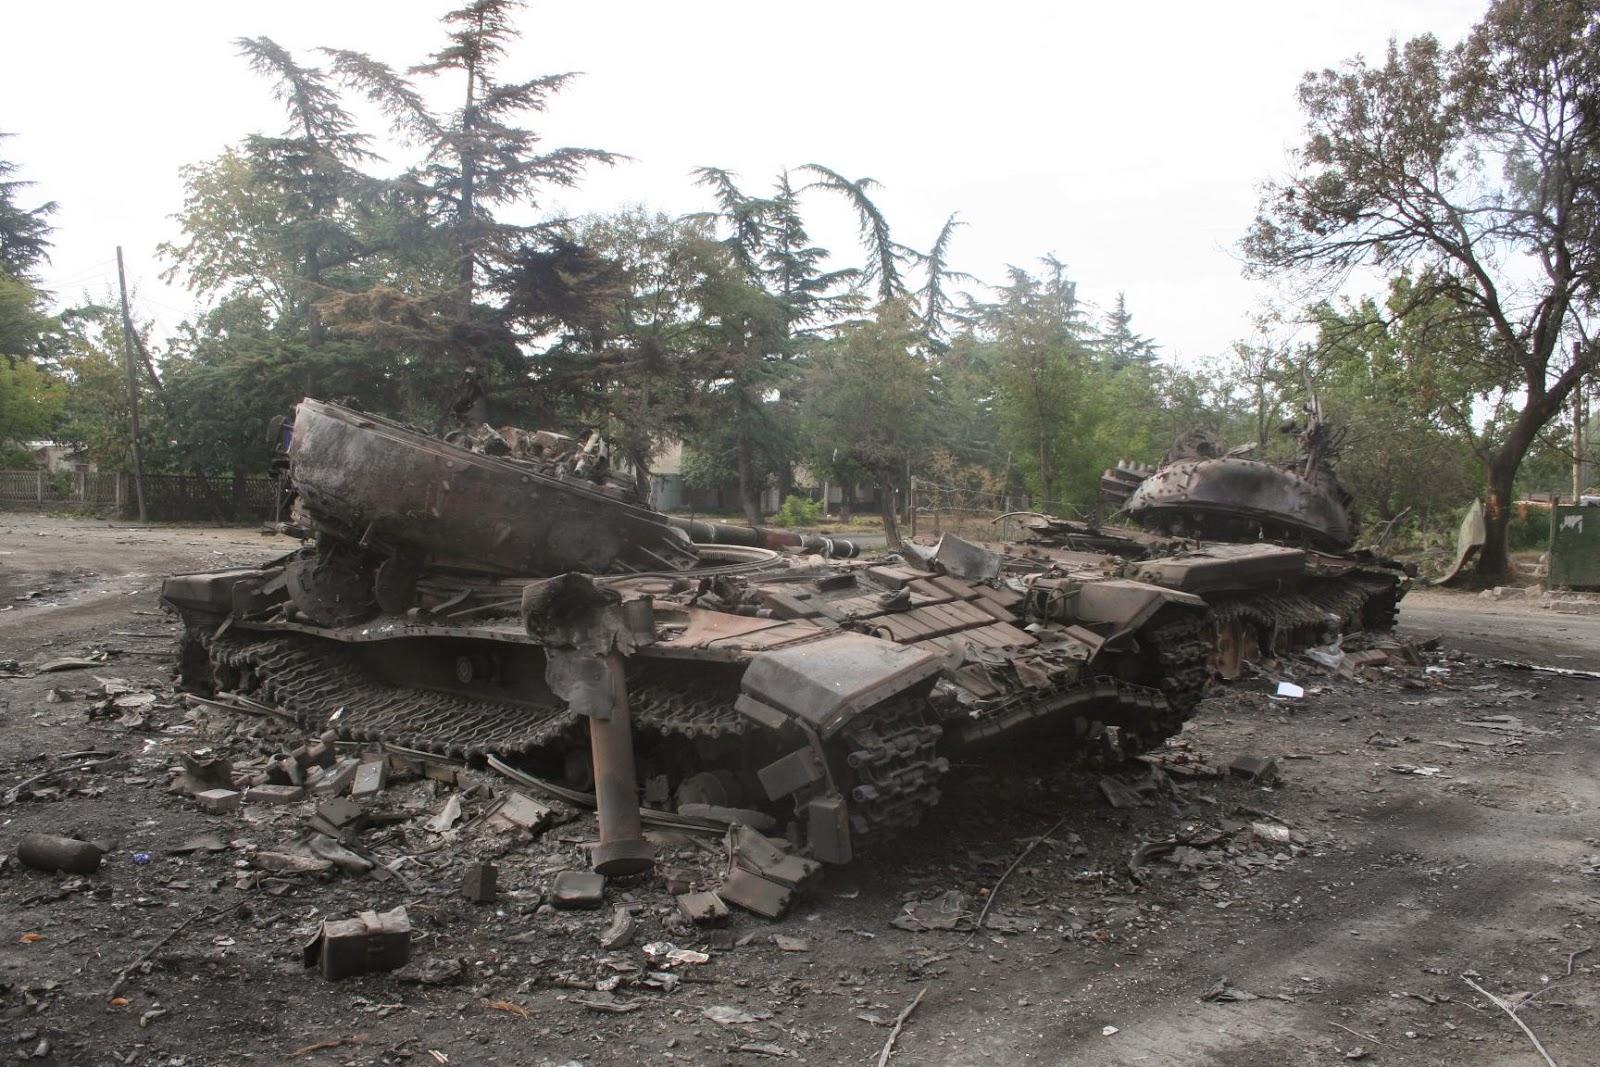 Сгоревший танк защищавший столицу лнр